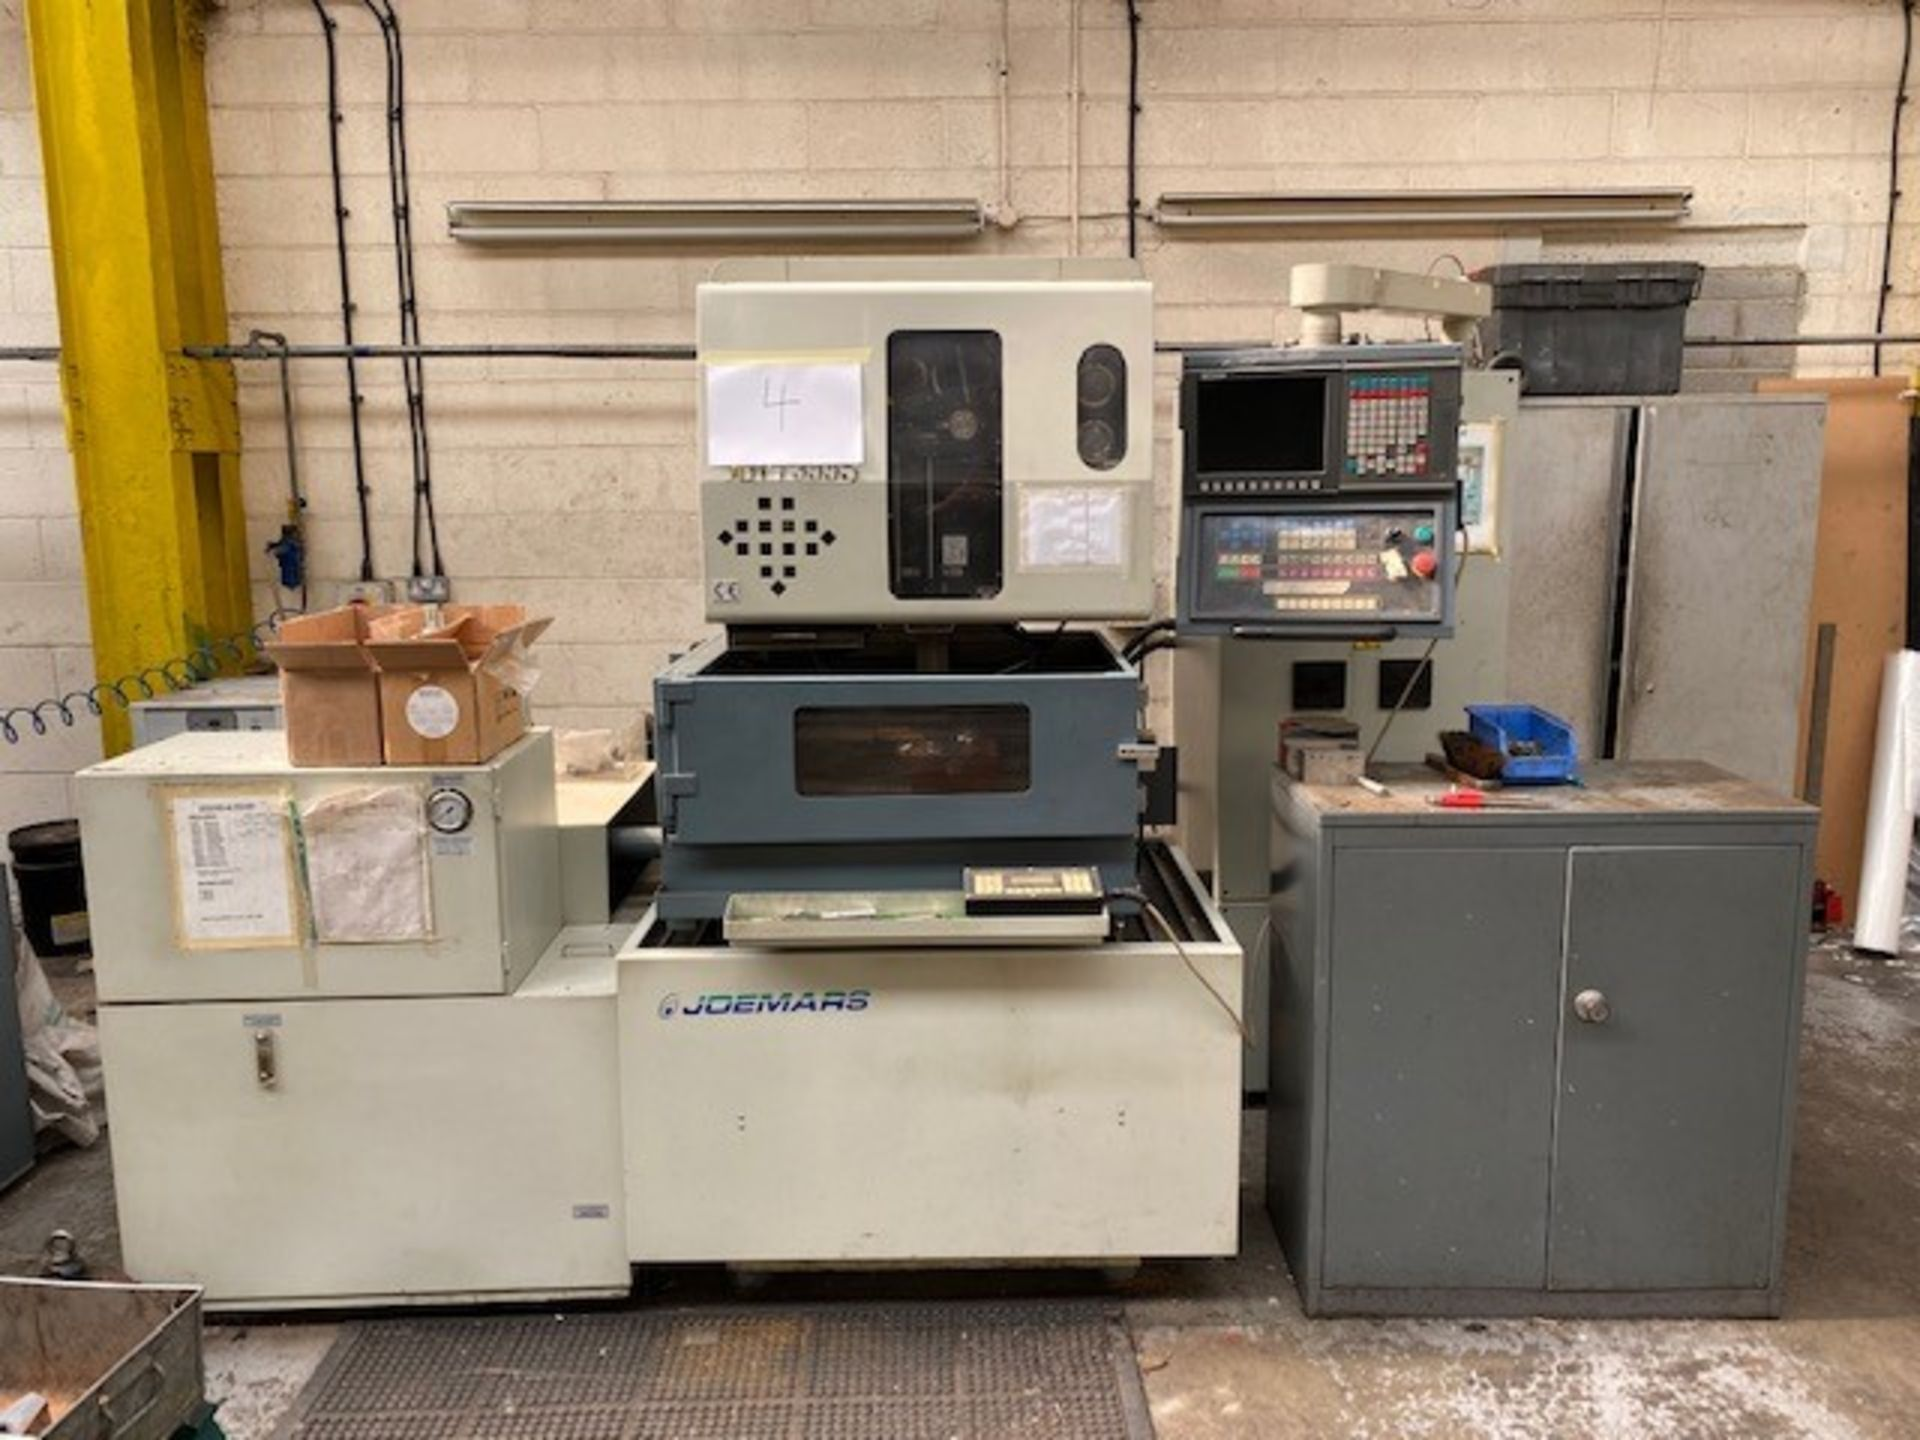 JOEMARS EURO SPARK EROSION CNC/EDM MACHINE WITH JOEMARS AL-5 CONTROLLER AND HABOR CHILLER TANK